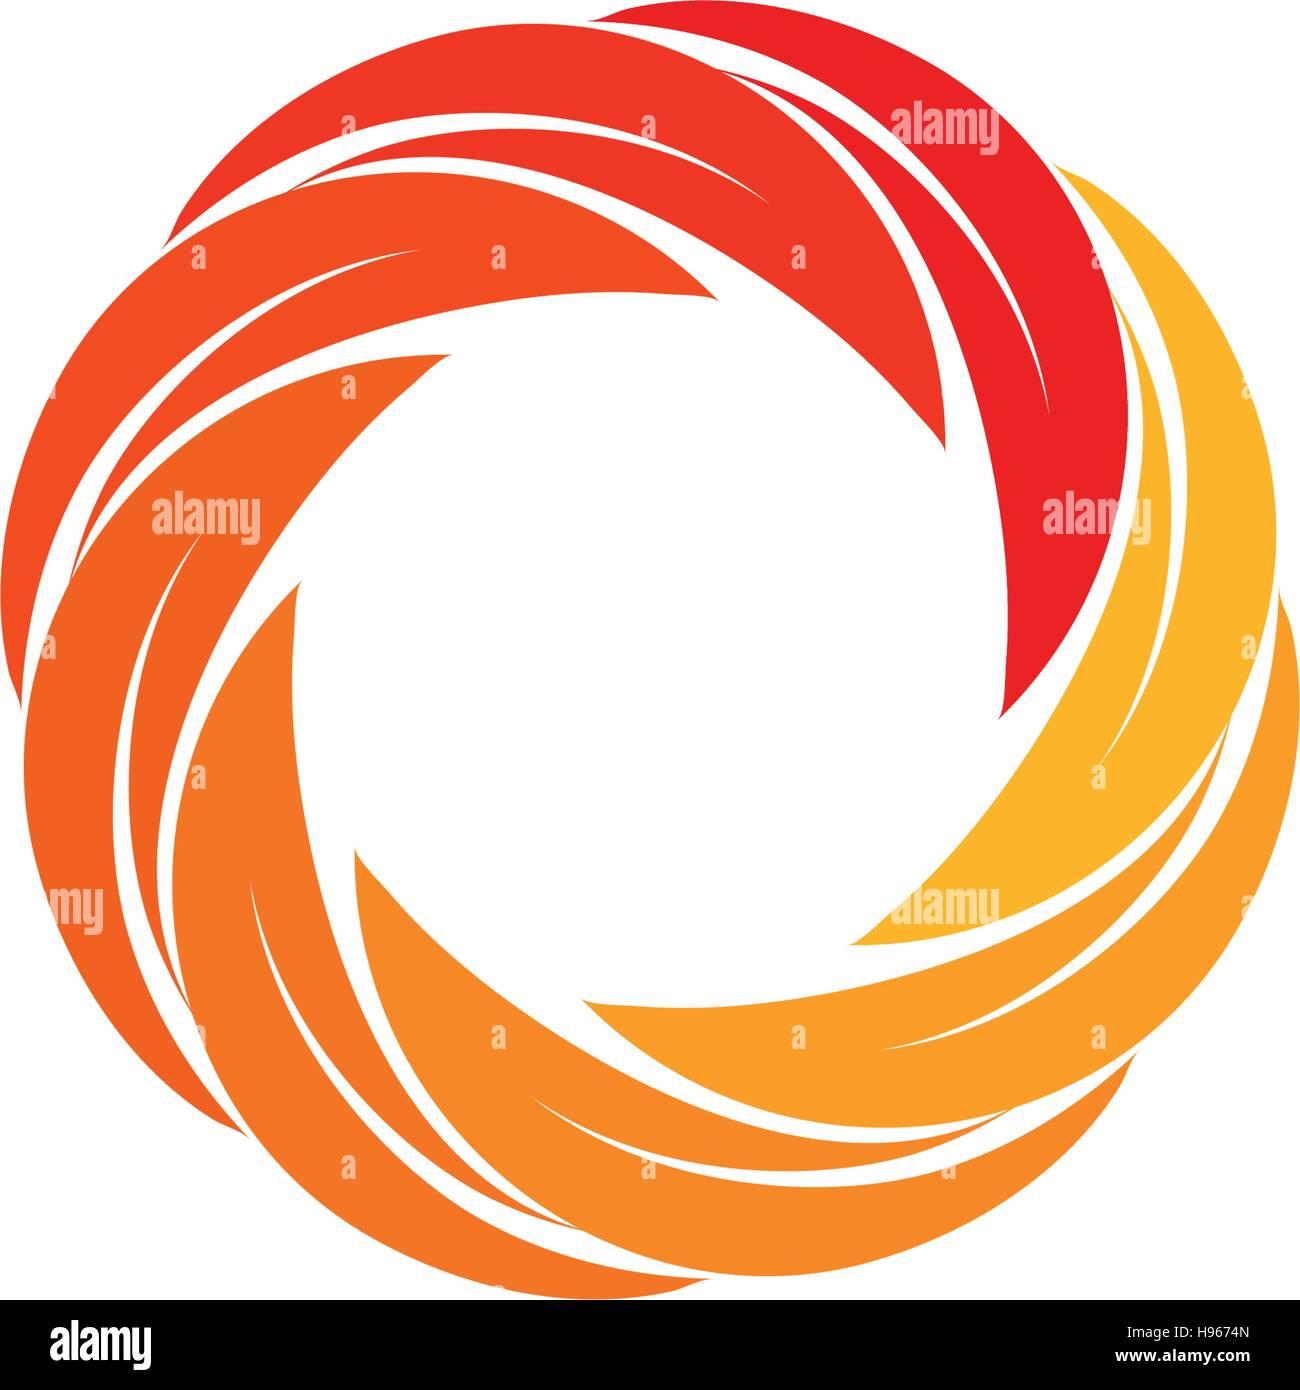 isolated abstract red orange yellow circular sun logo round shape